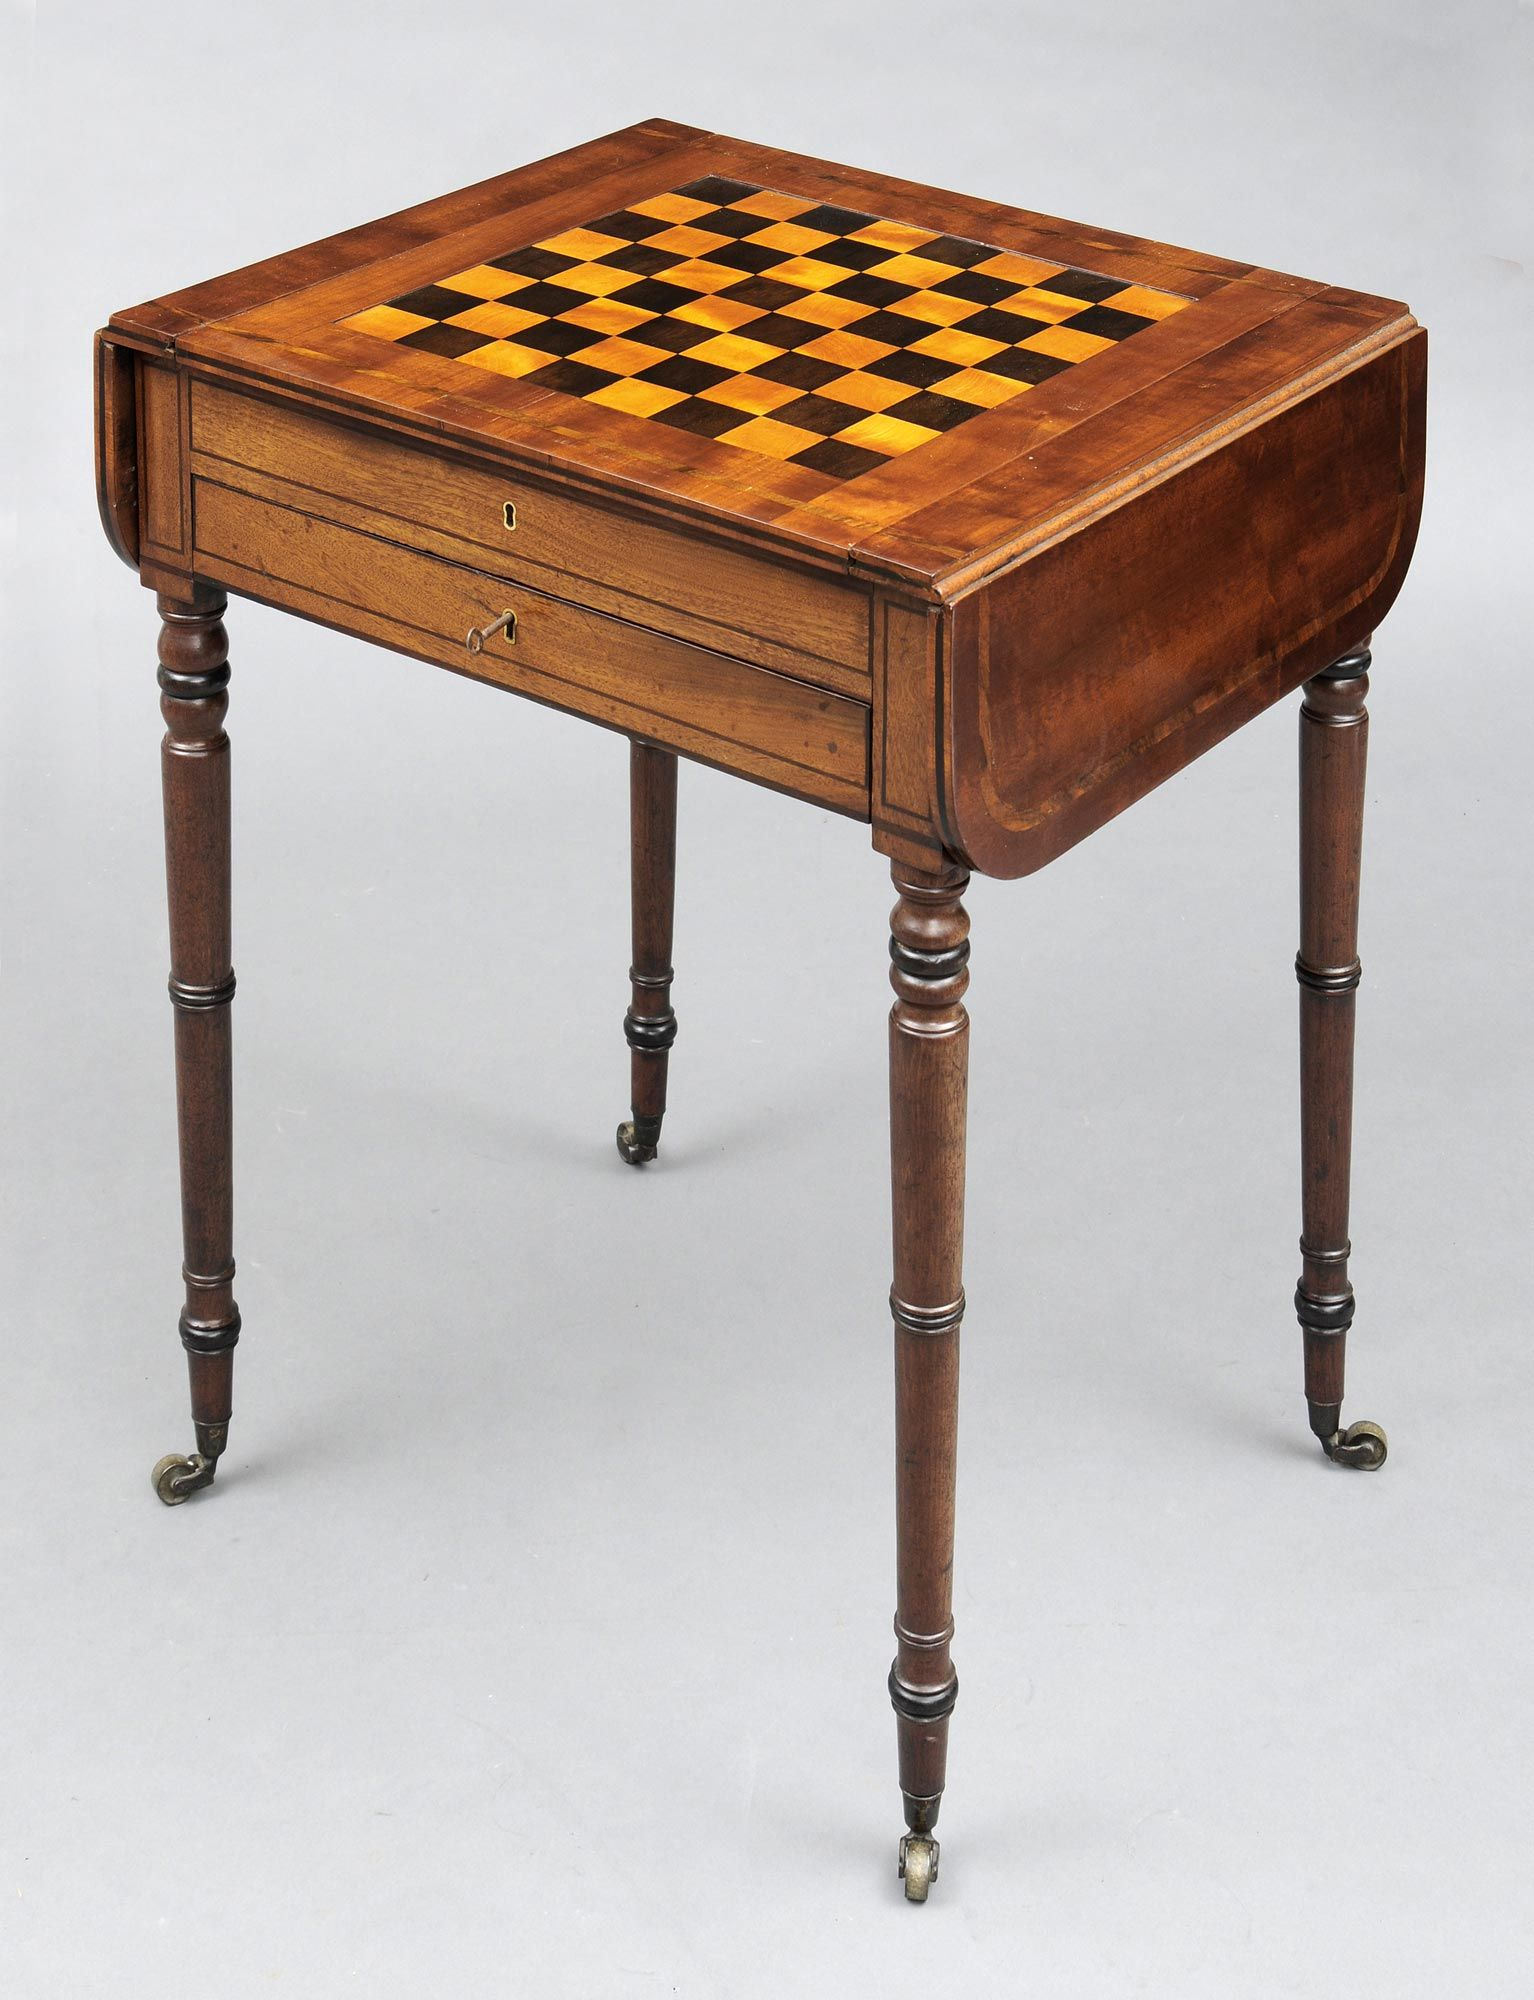 English Antique Regency Table